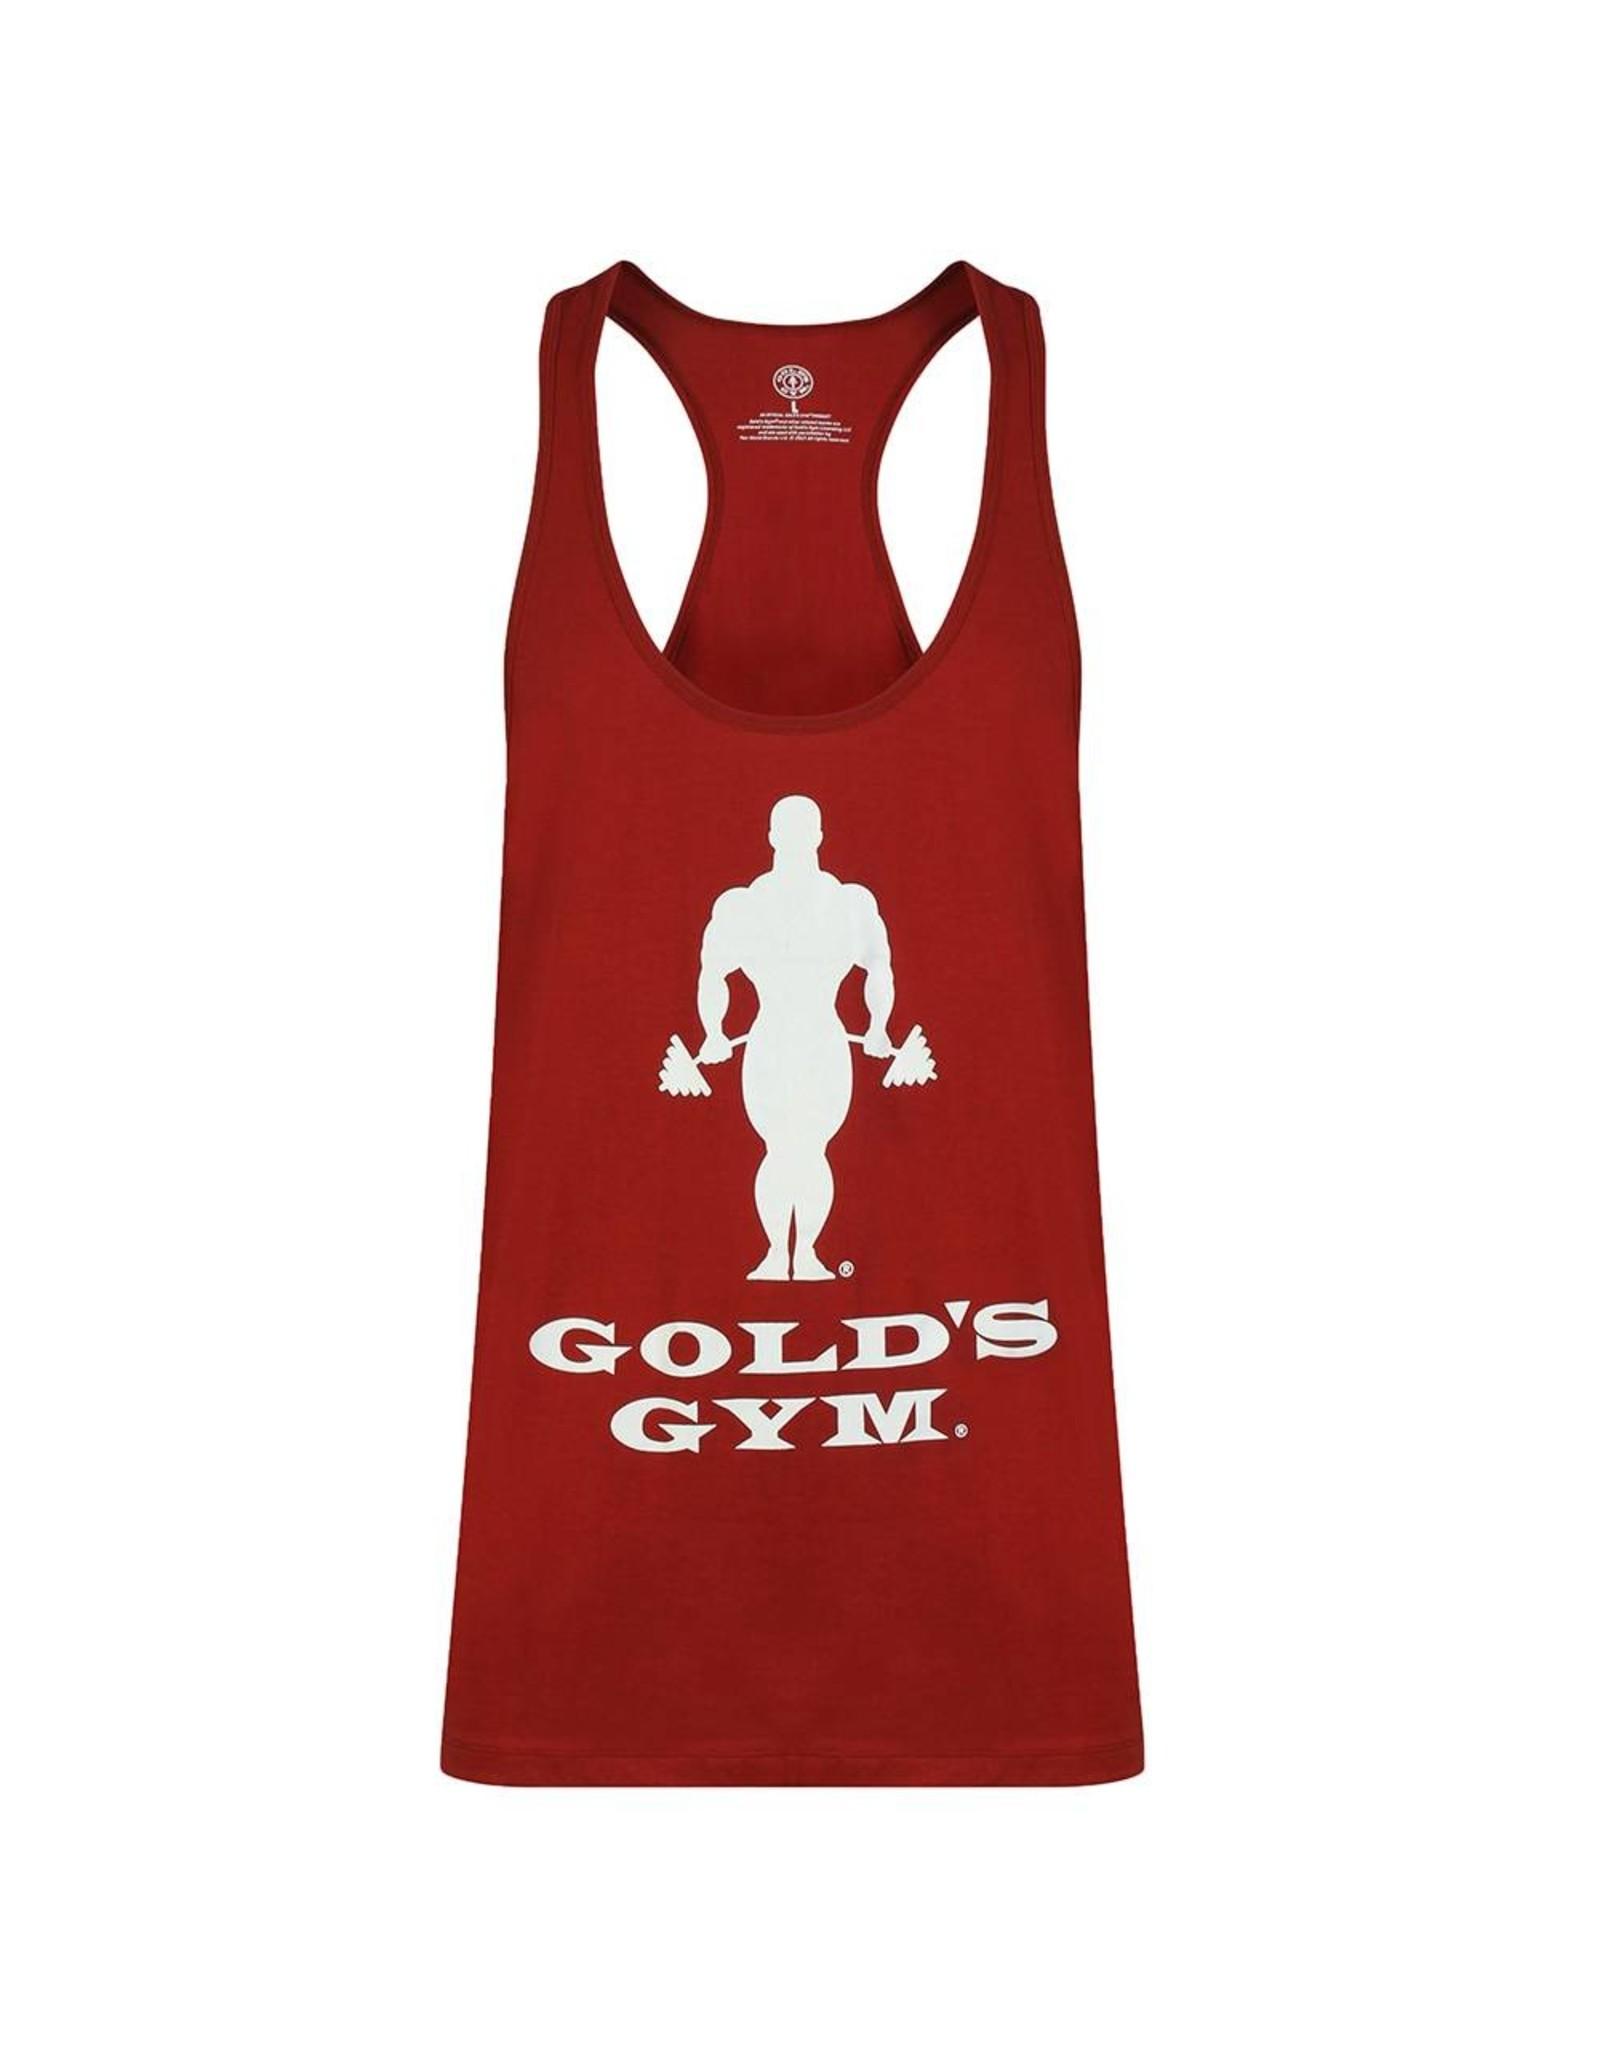 Gold's Gym Slogan Premium Stringer Vest - Burgundy